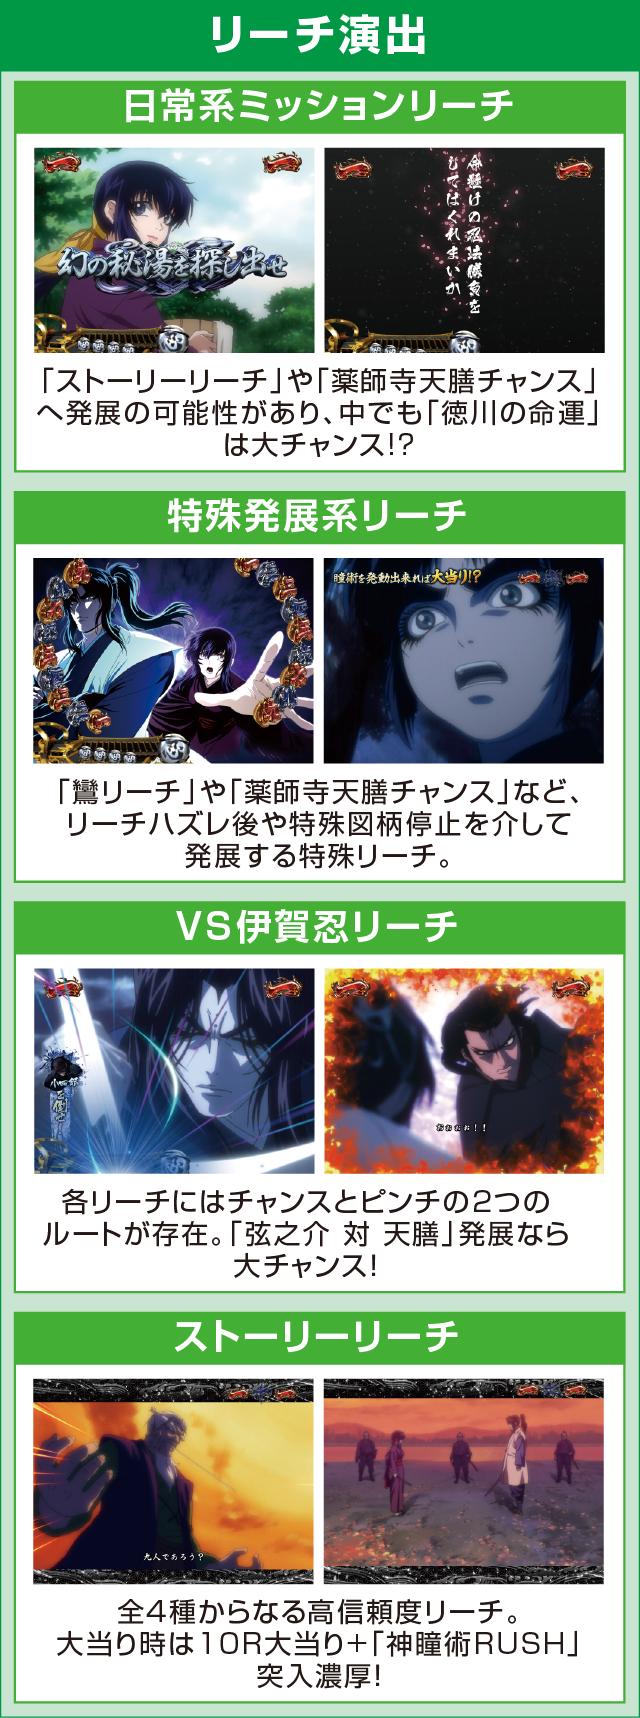 Pバジリスク~甲賀忍法帖~2のピックアップポイント